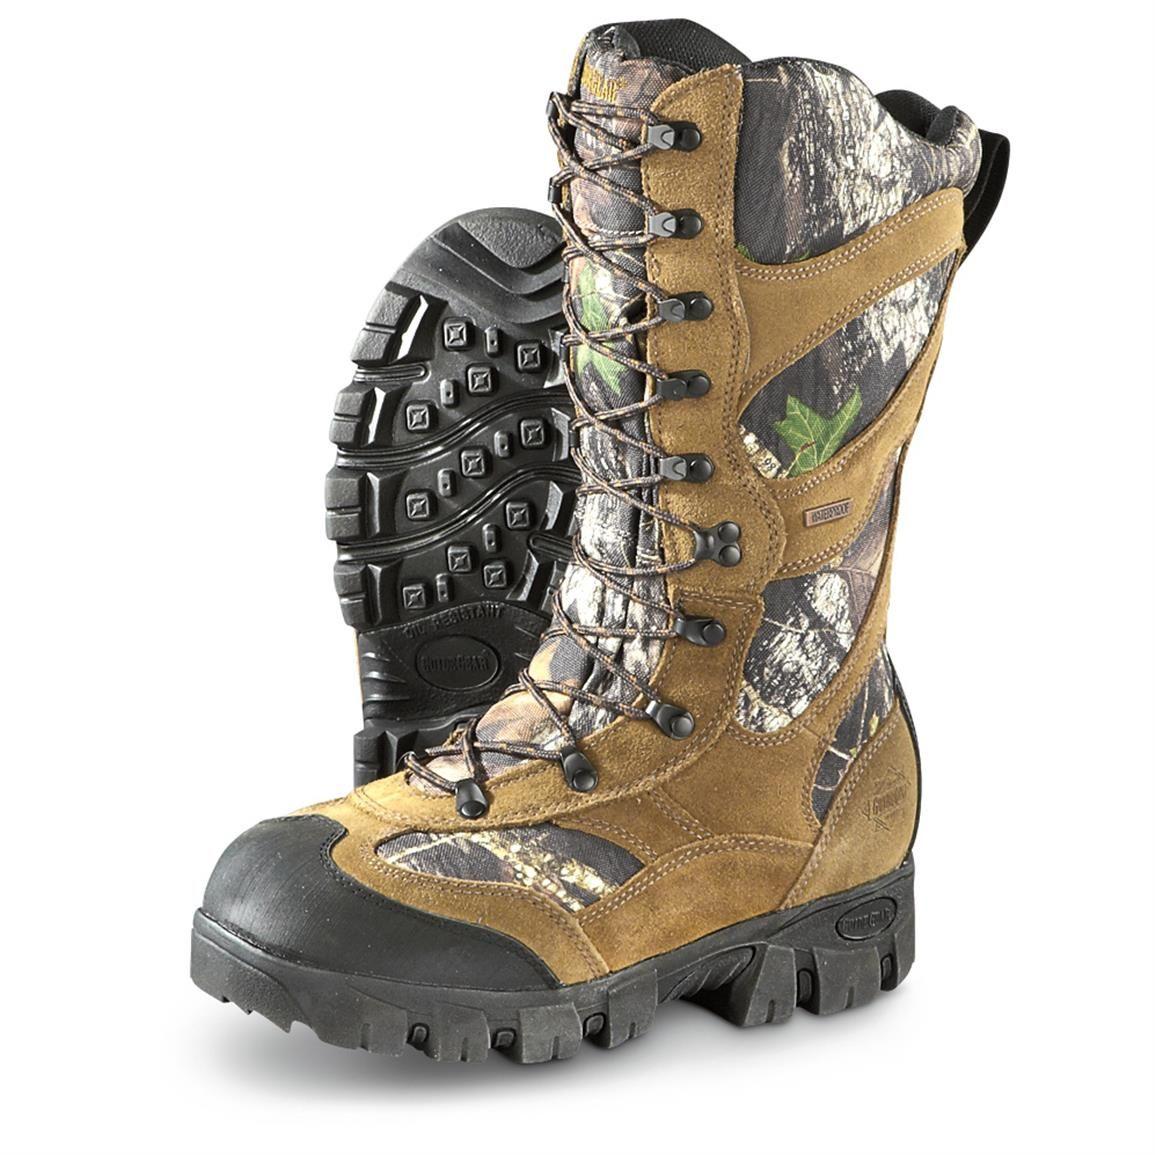 huge selection of 9d8d0 5e453 Men's Guide Gear® Waterproof 1,400 gram Thinsulate™ Ultra ...